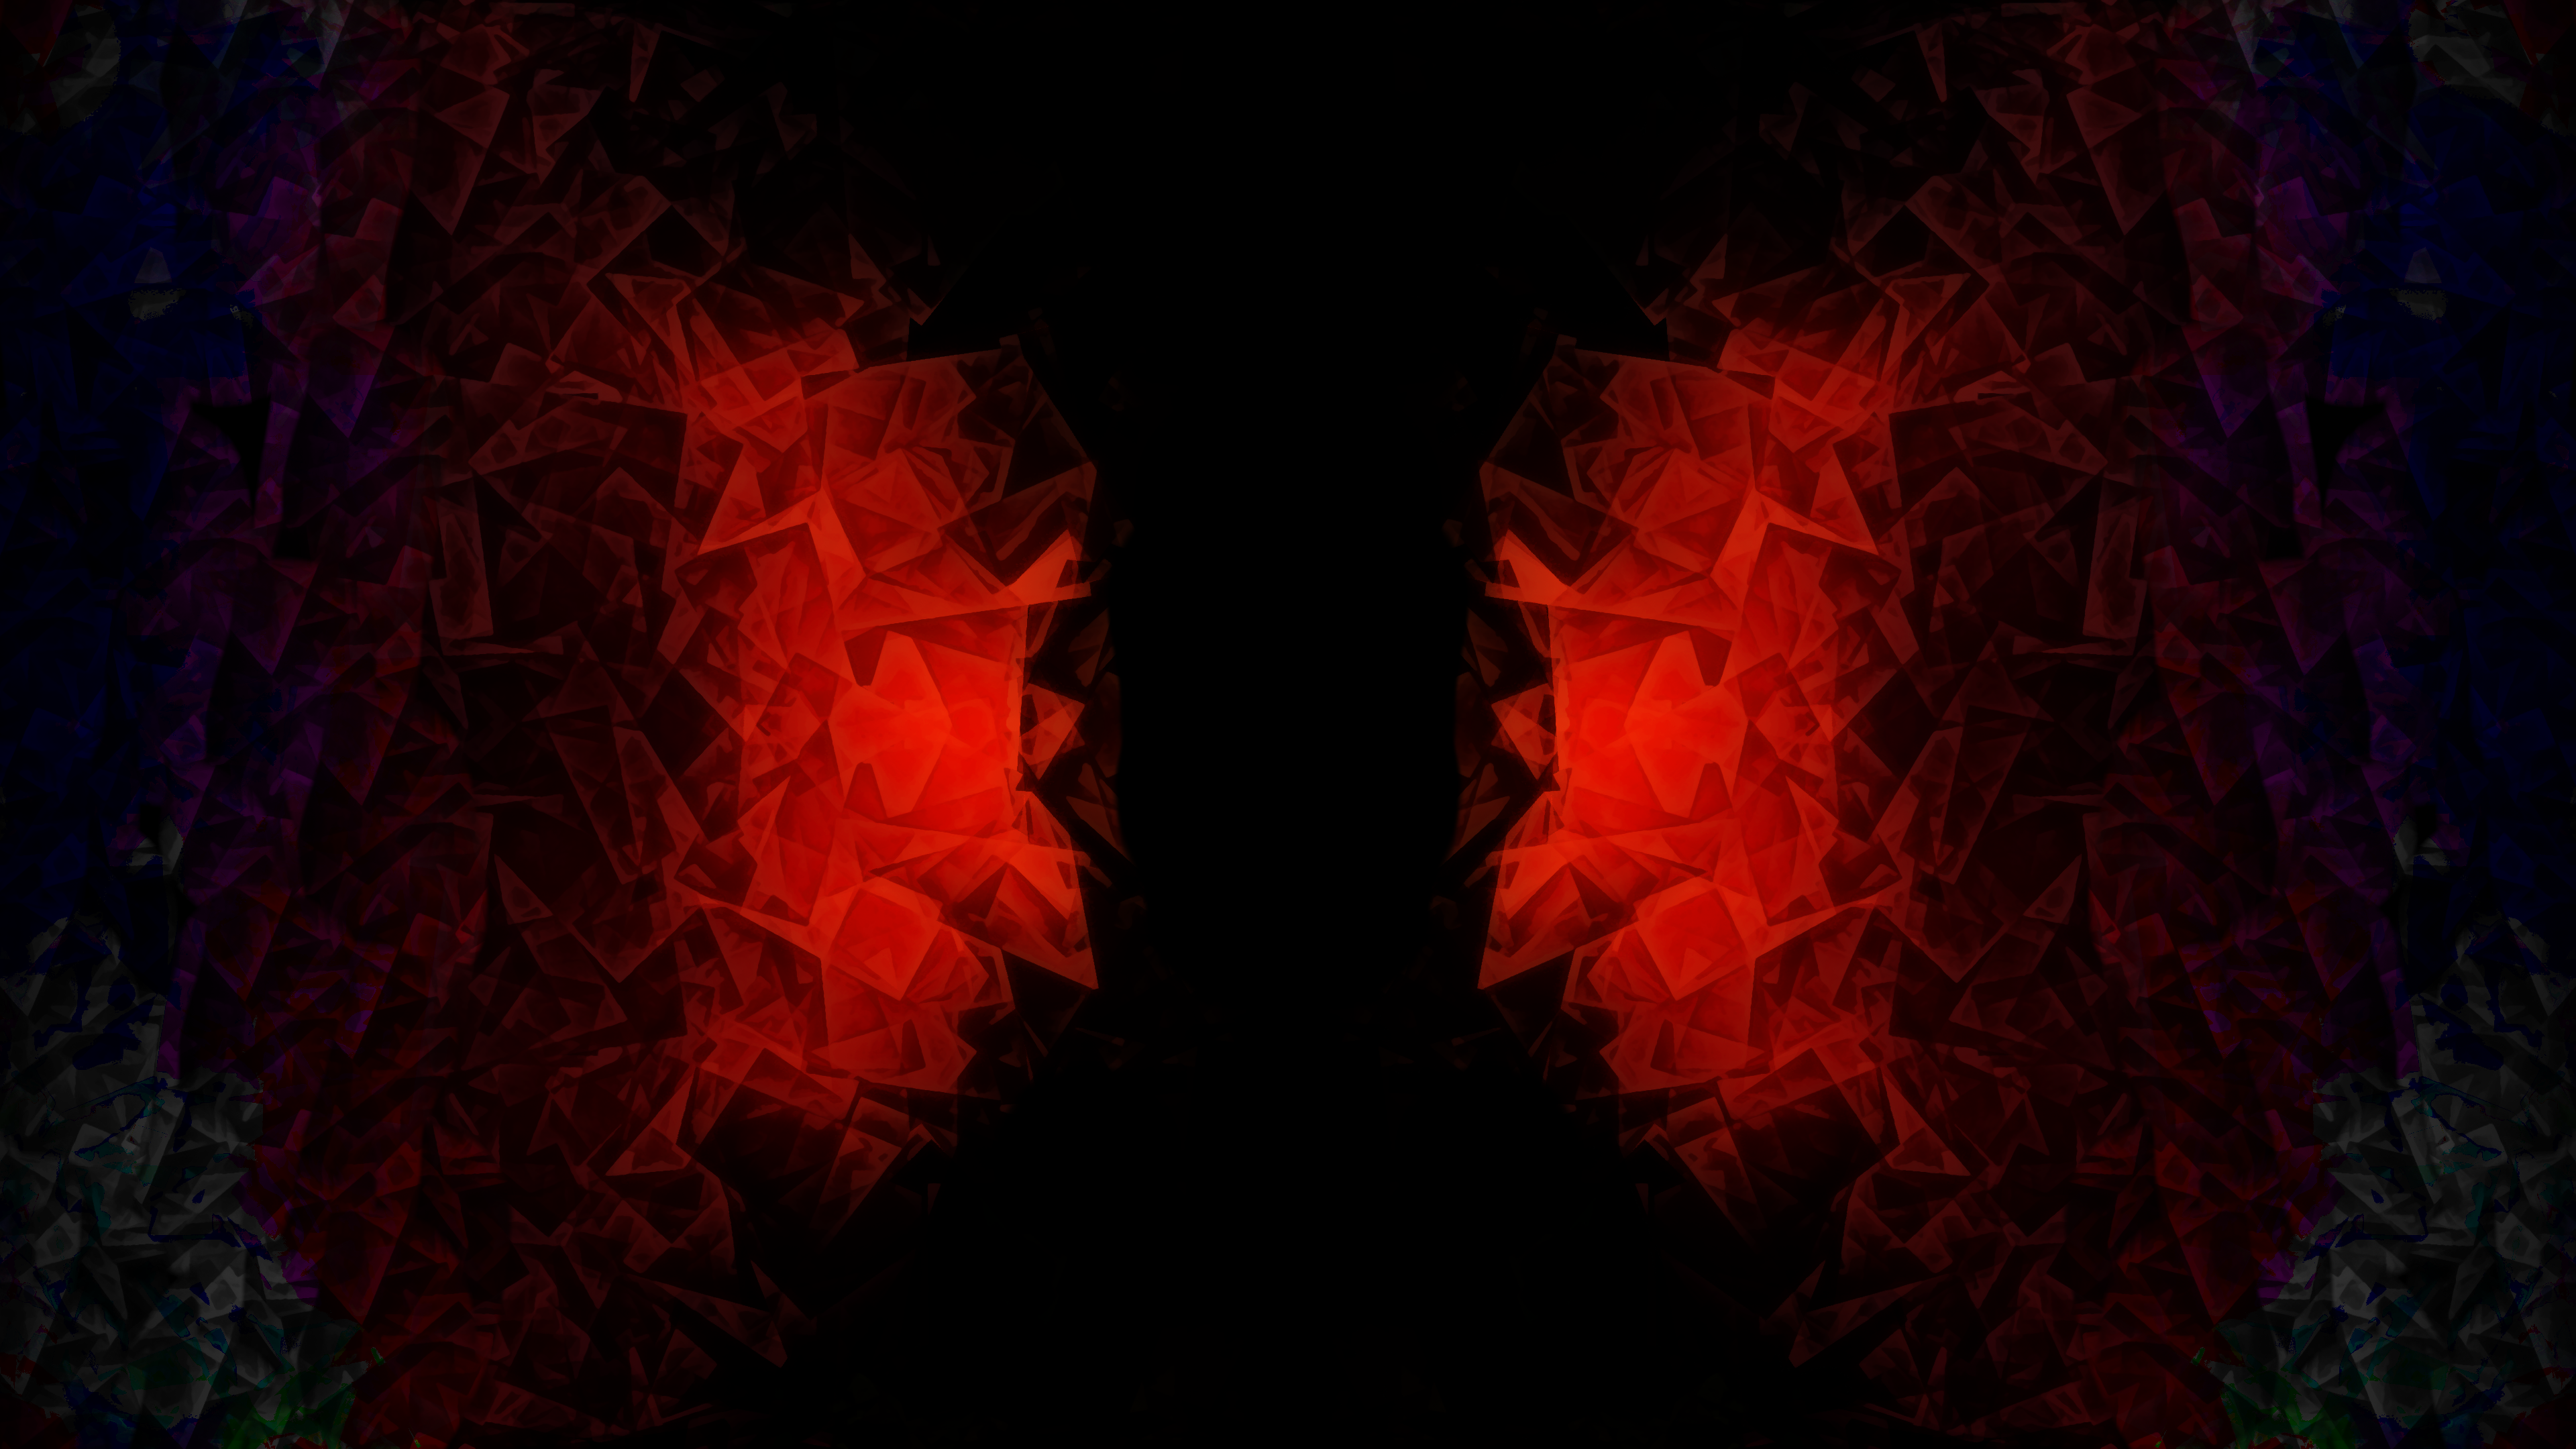 D D Crystal 4k Ultra Hd Wallpaper Background Image